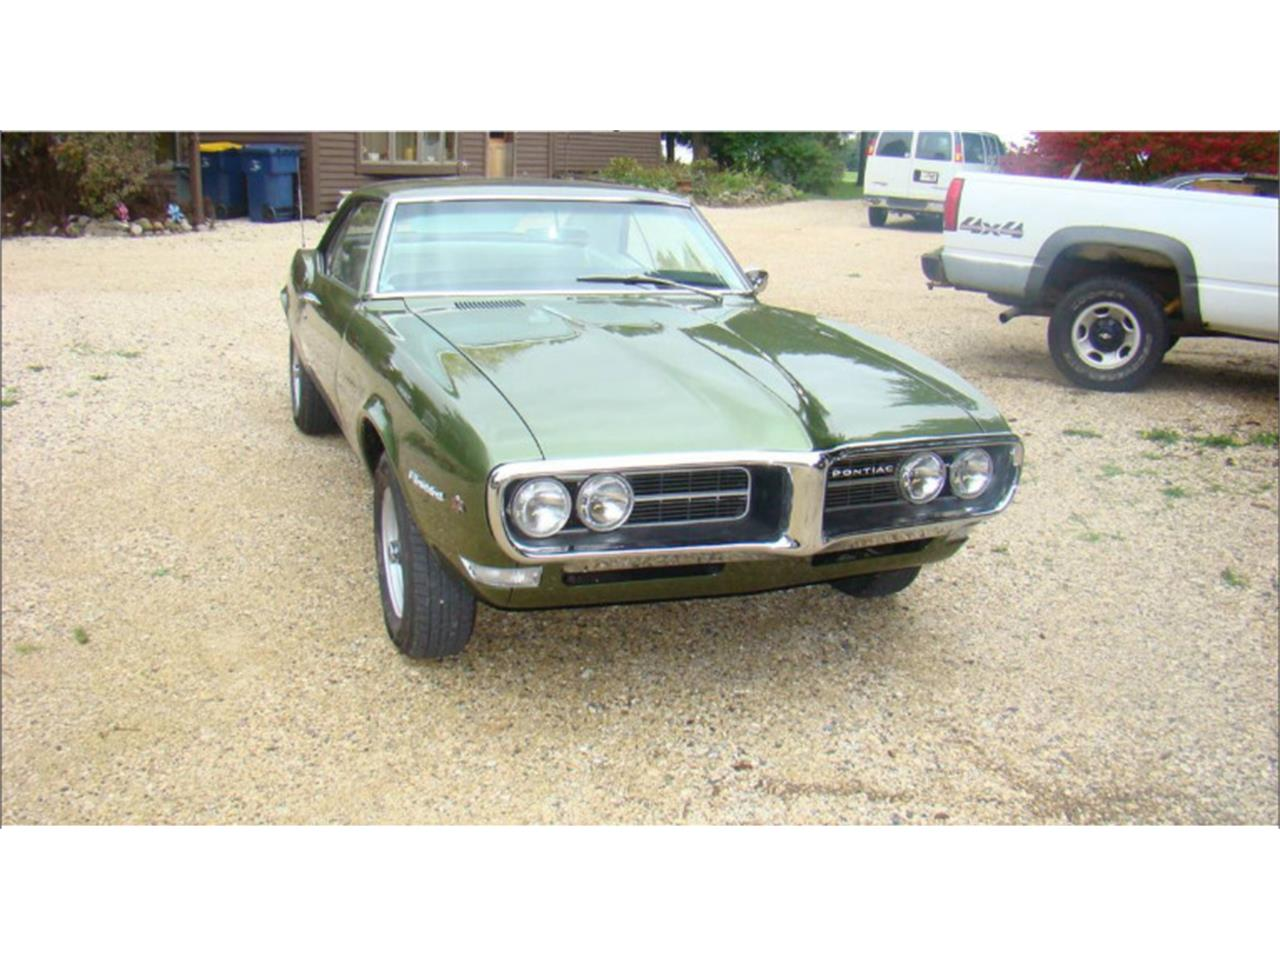 Large Picture of '68 Pontiac Firebird located in Mundelein Illinois - $29,750.00 - PUGP